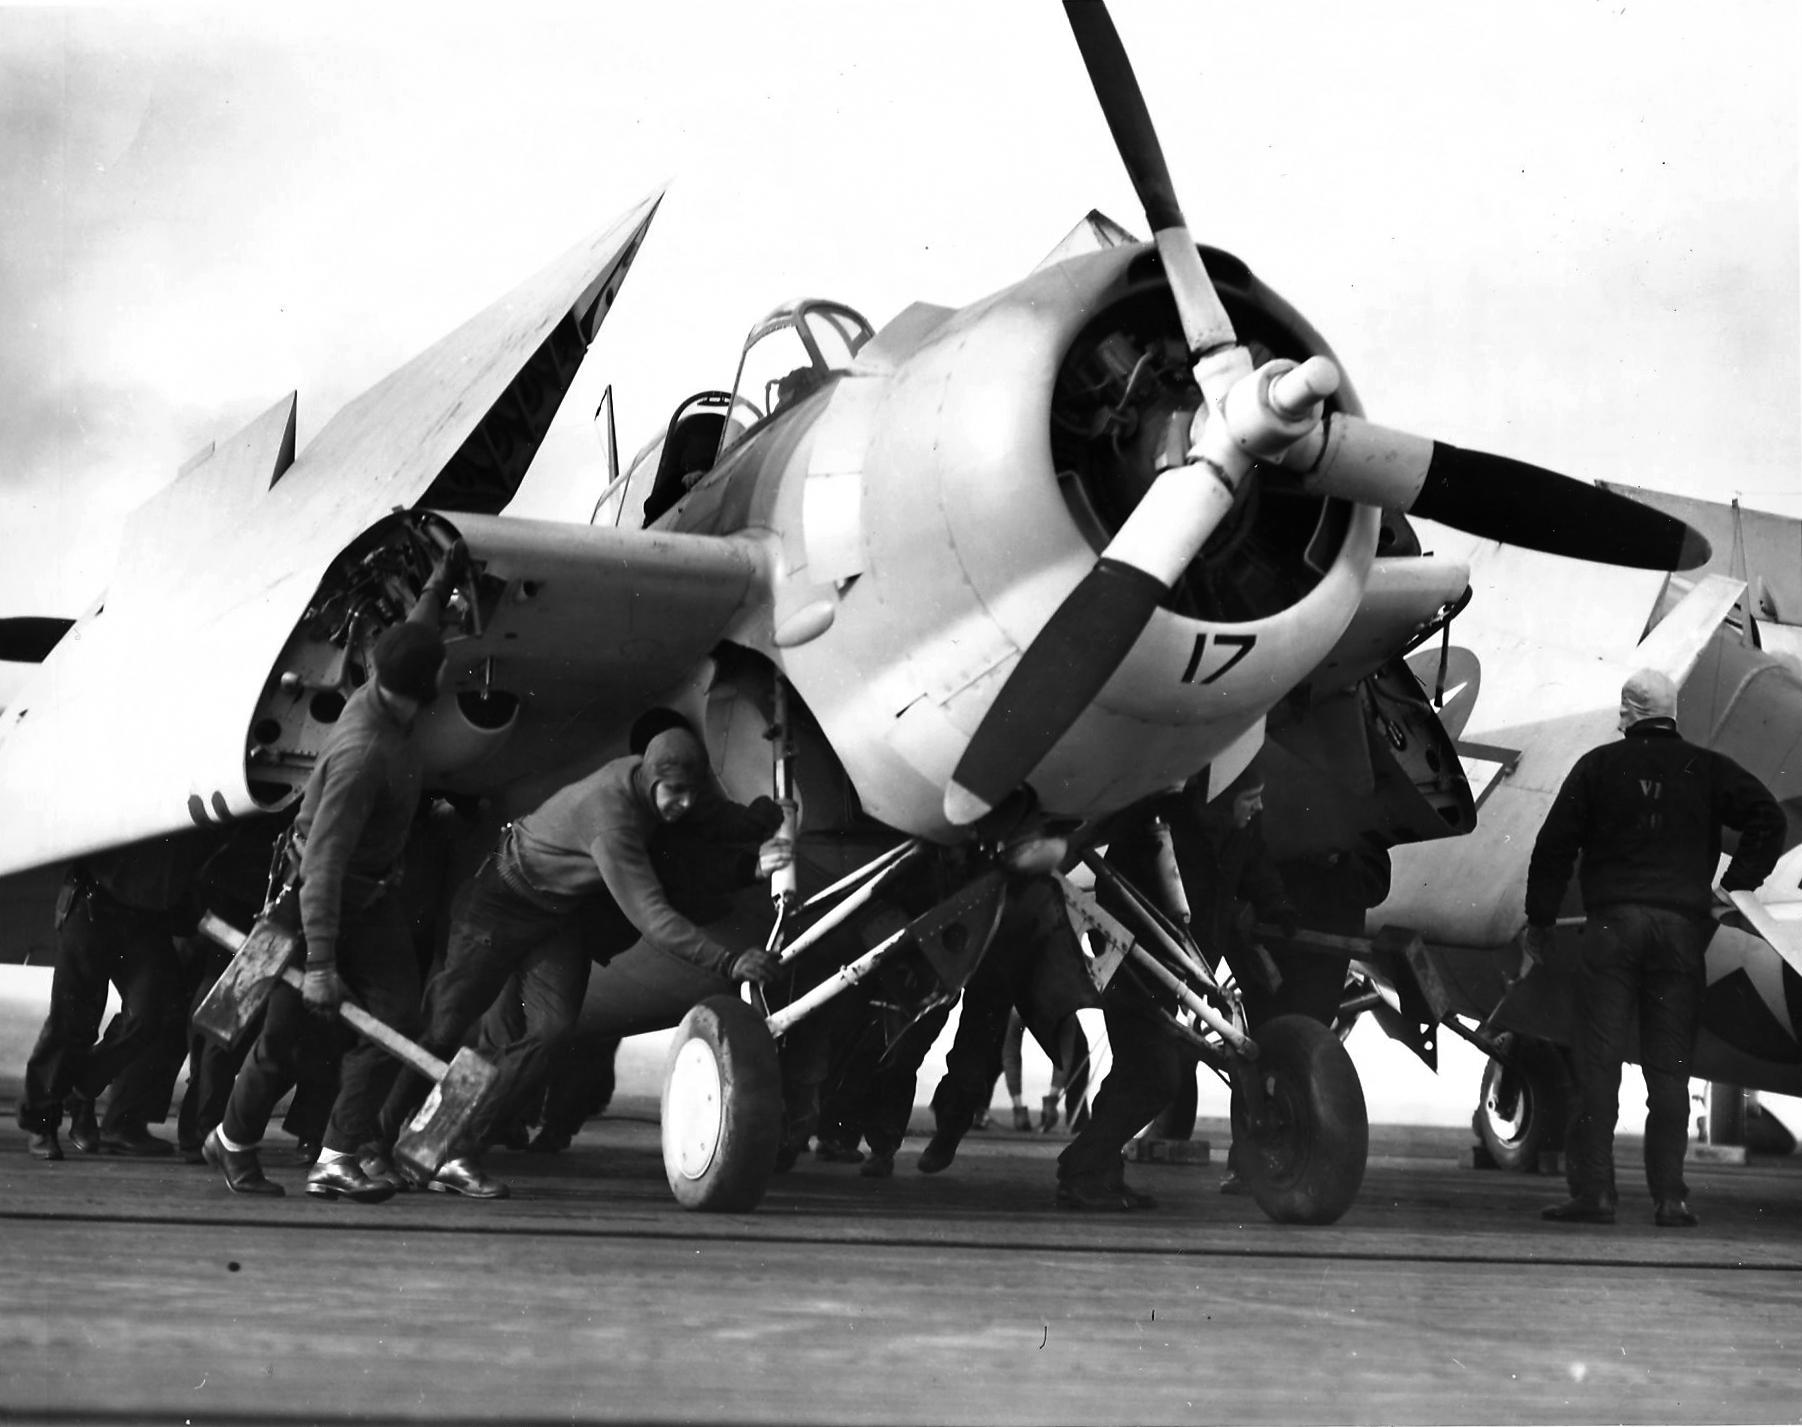 Wildcat Black 17 manpower is needed when winds blow across a carrier's flight deck 30th Apr 1944 01